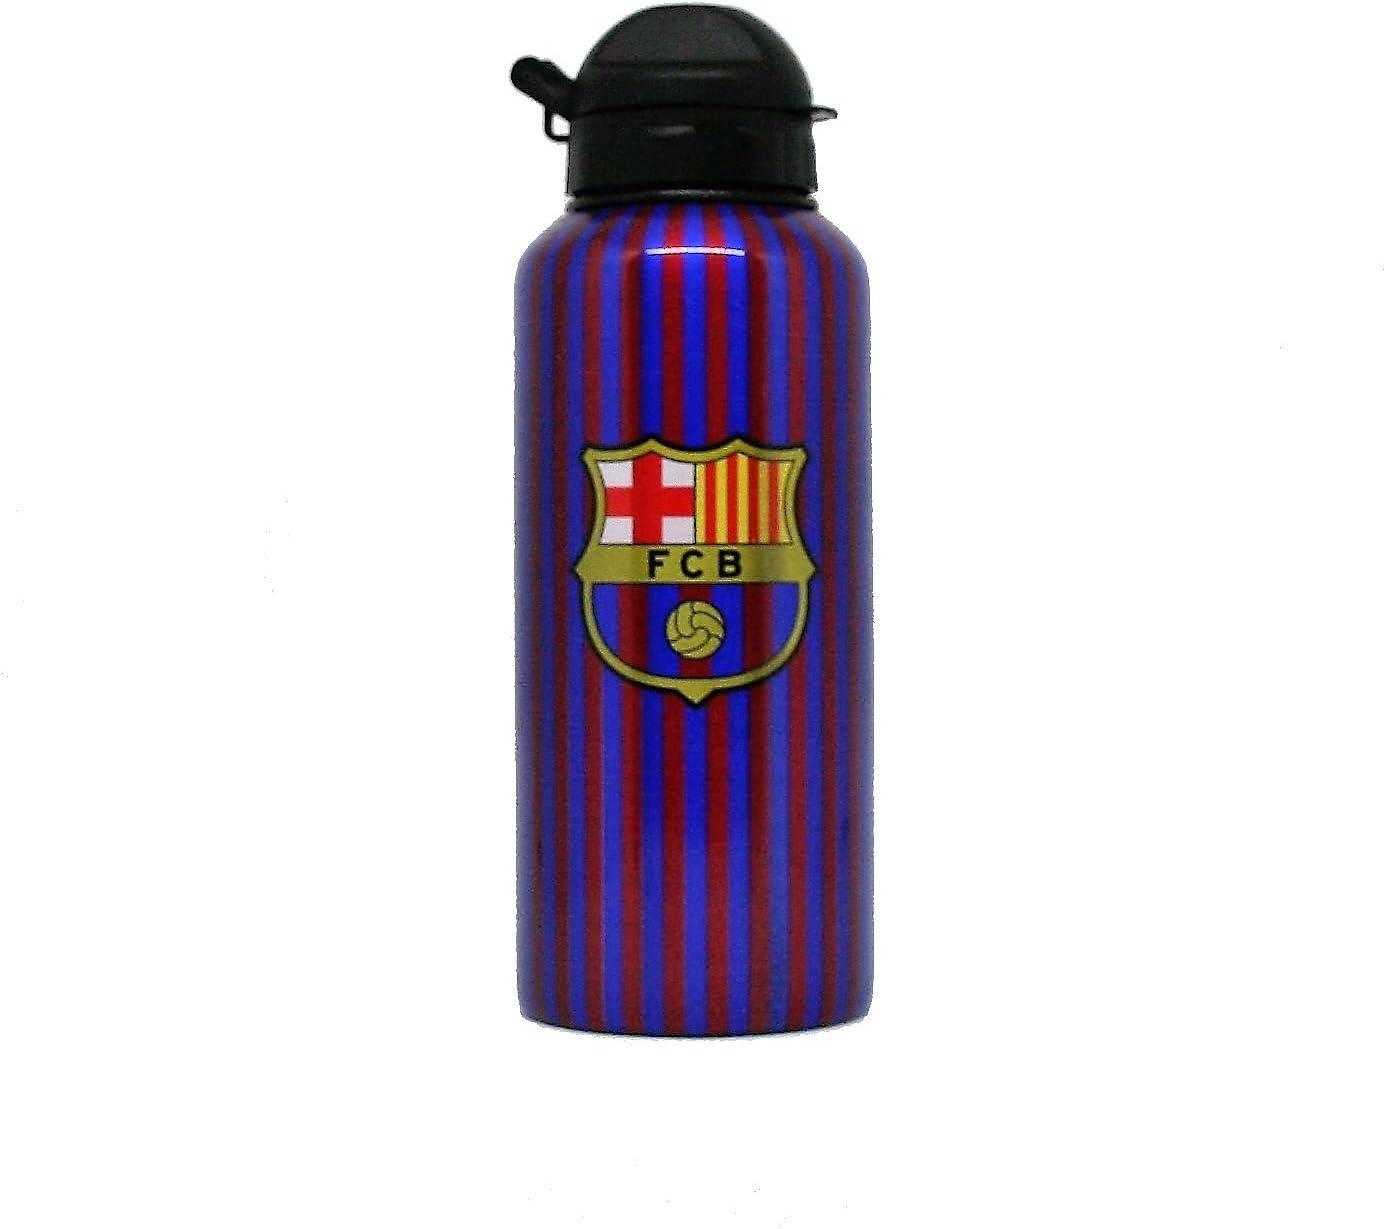 Ausport Bottles, SL. FCB Classic 2018-2019 Botella Deportiva Aluminio, grana, M